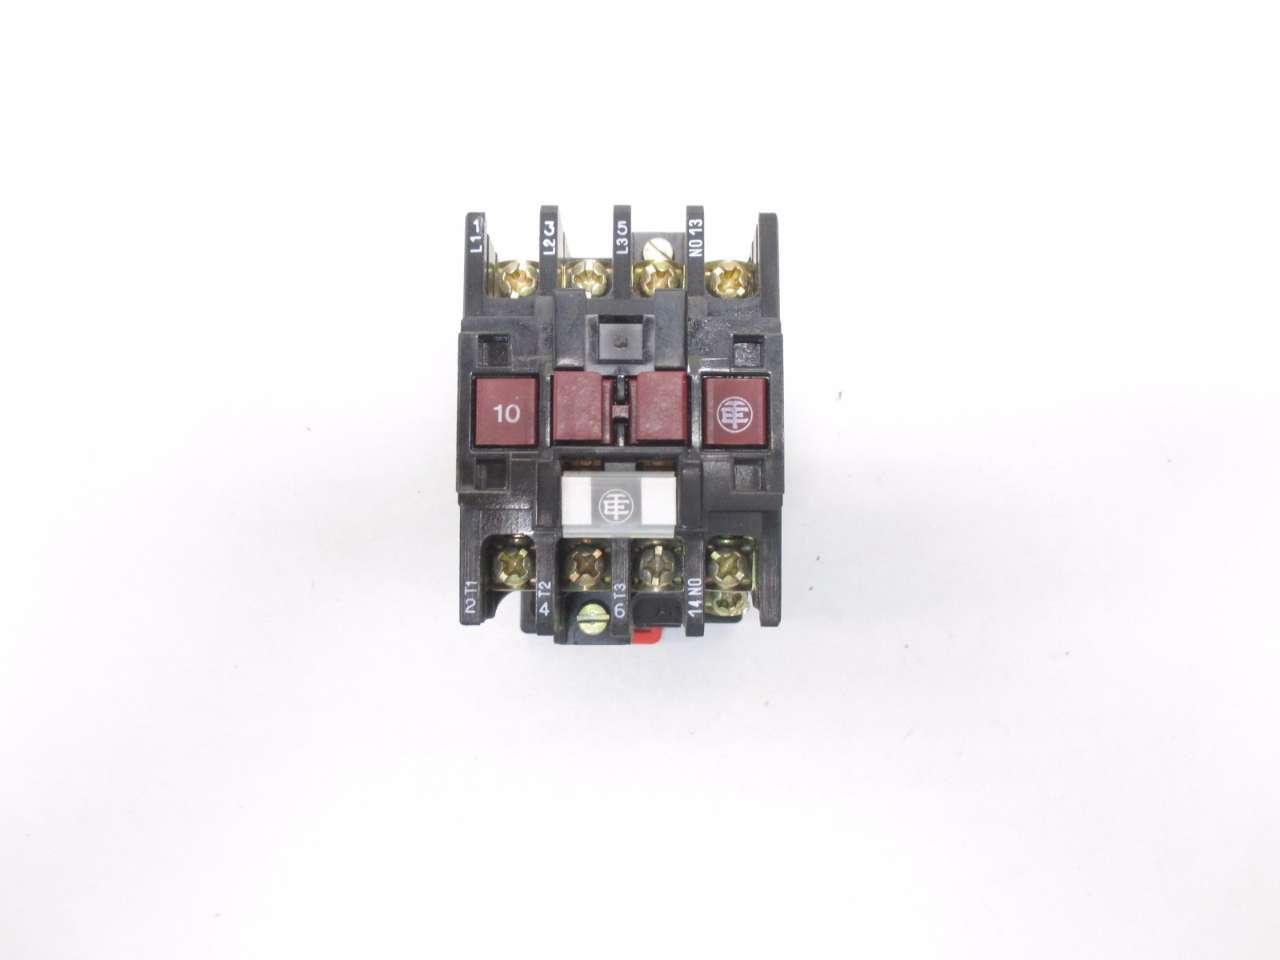 RIBBON CABLE 20WAY PRO POWER AXO-00027 FLAT 1.25MM